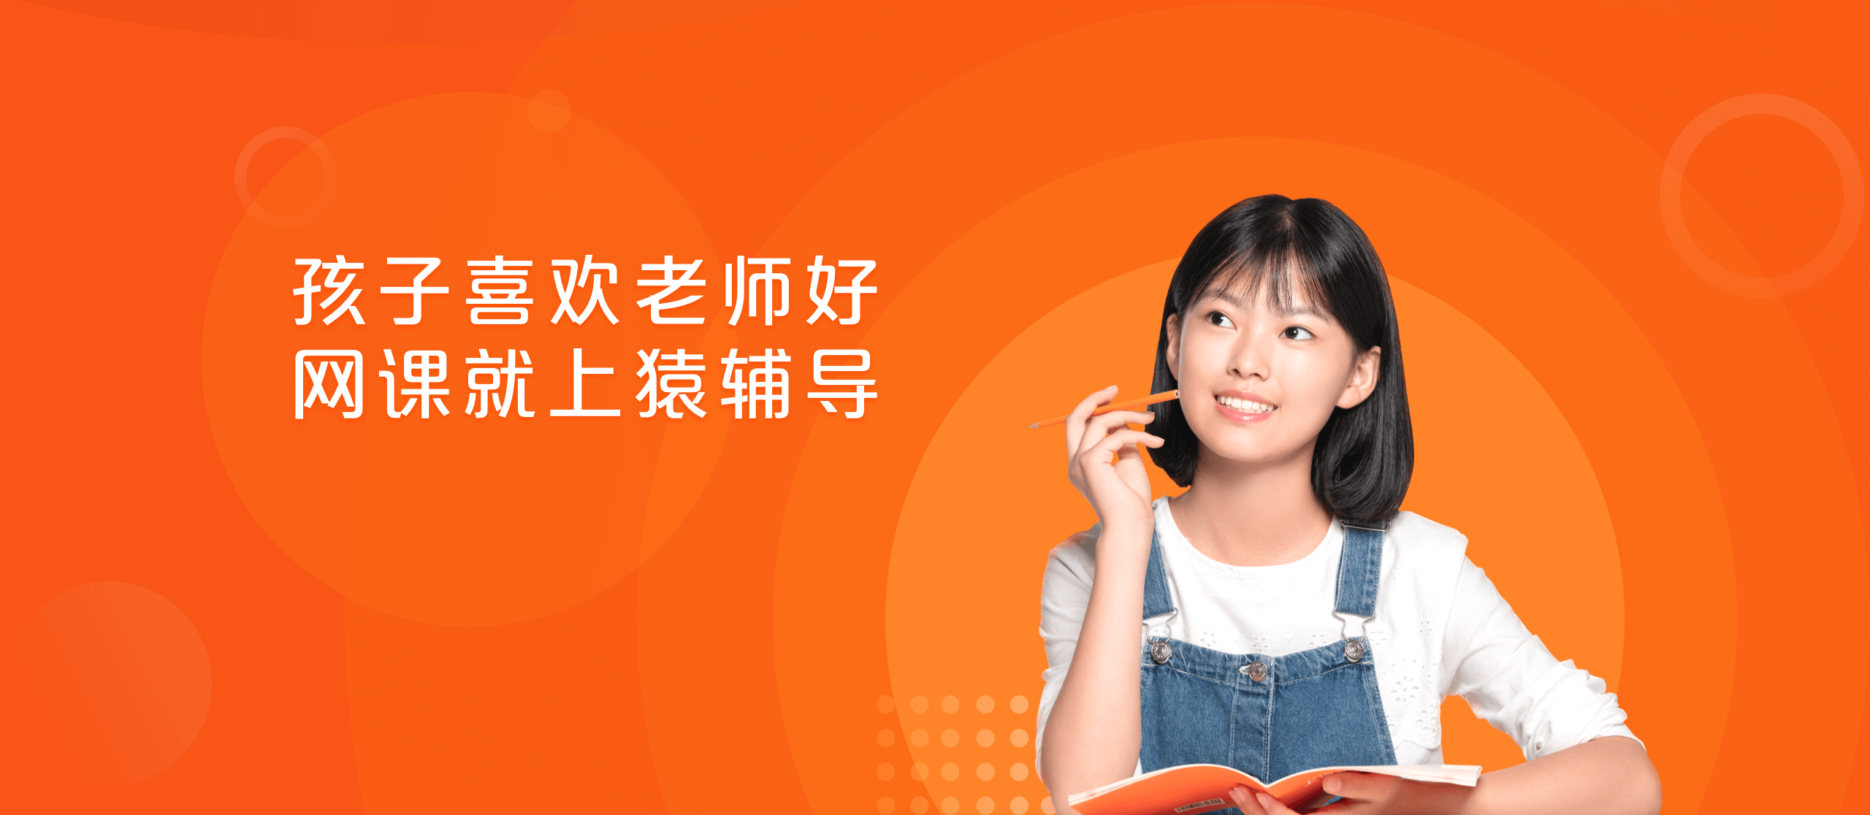 Credit: Yuanfudao. Yuanfudao online course China education market